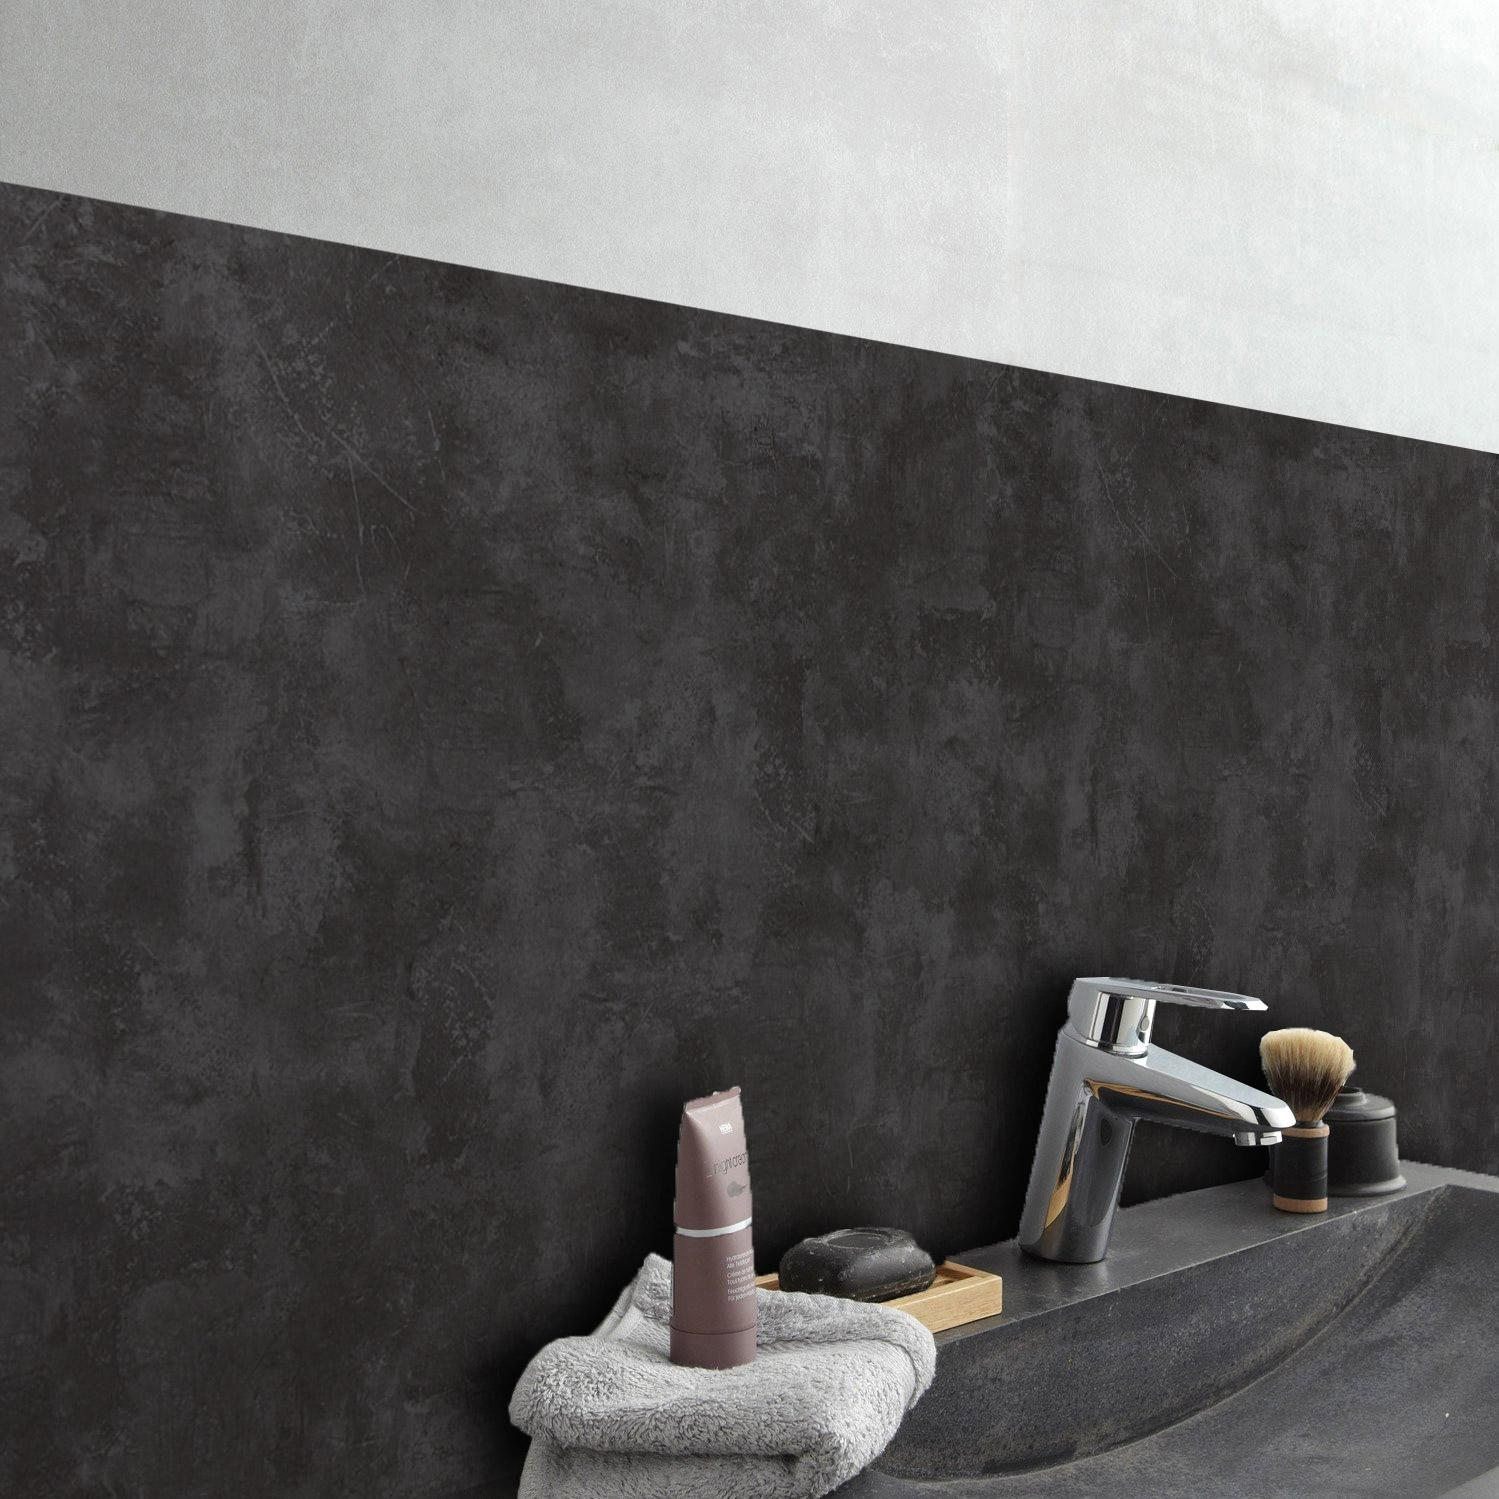 Crédence adhésive rigid ciment dark 24.5 cm x 49 cm